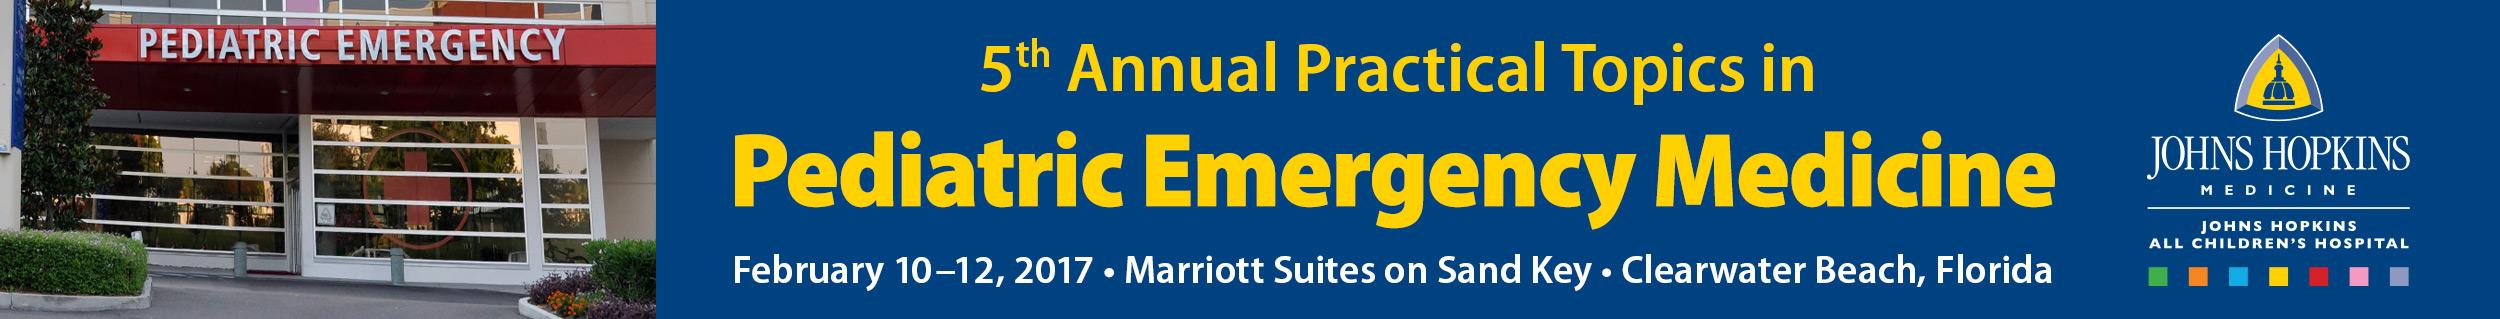 5th Annual Practical Topics in Pediatric Emergency Medicine